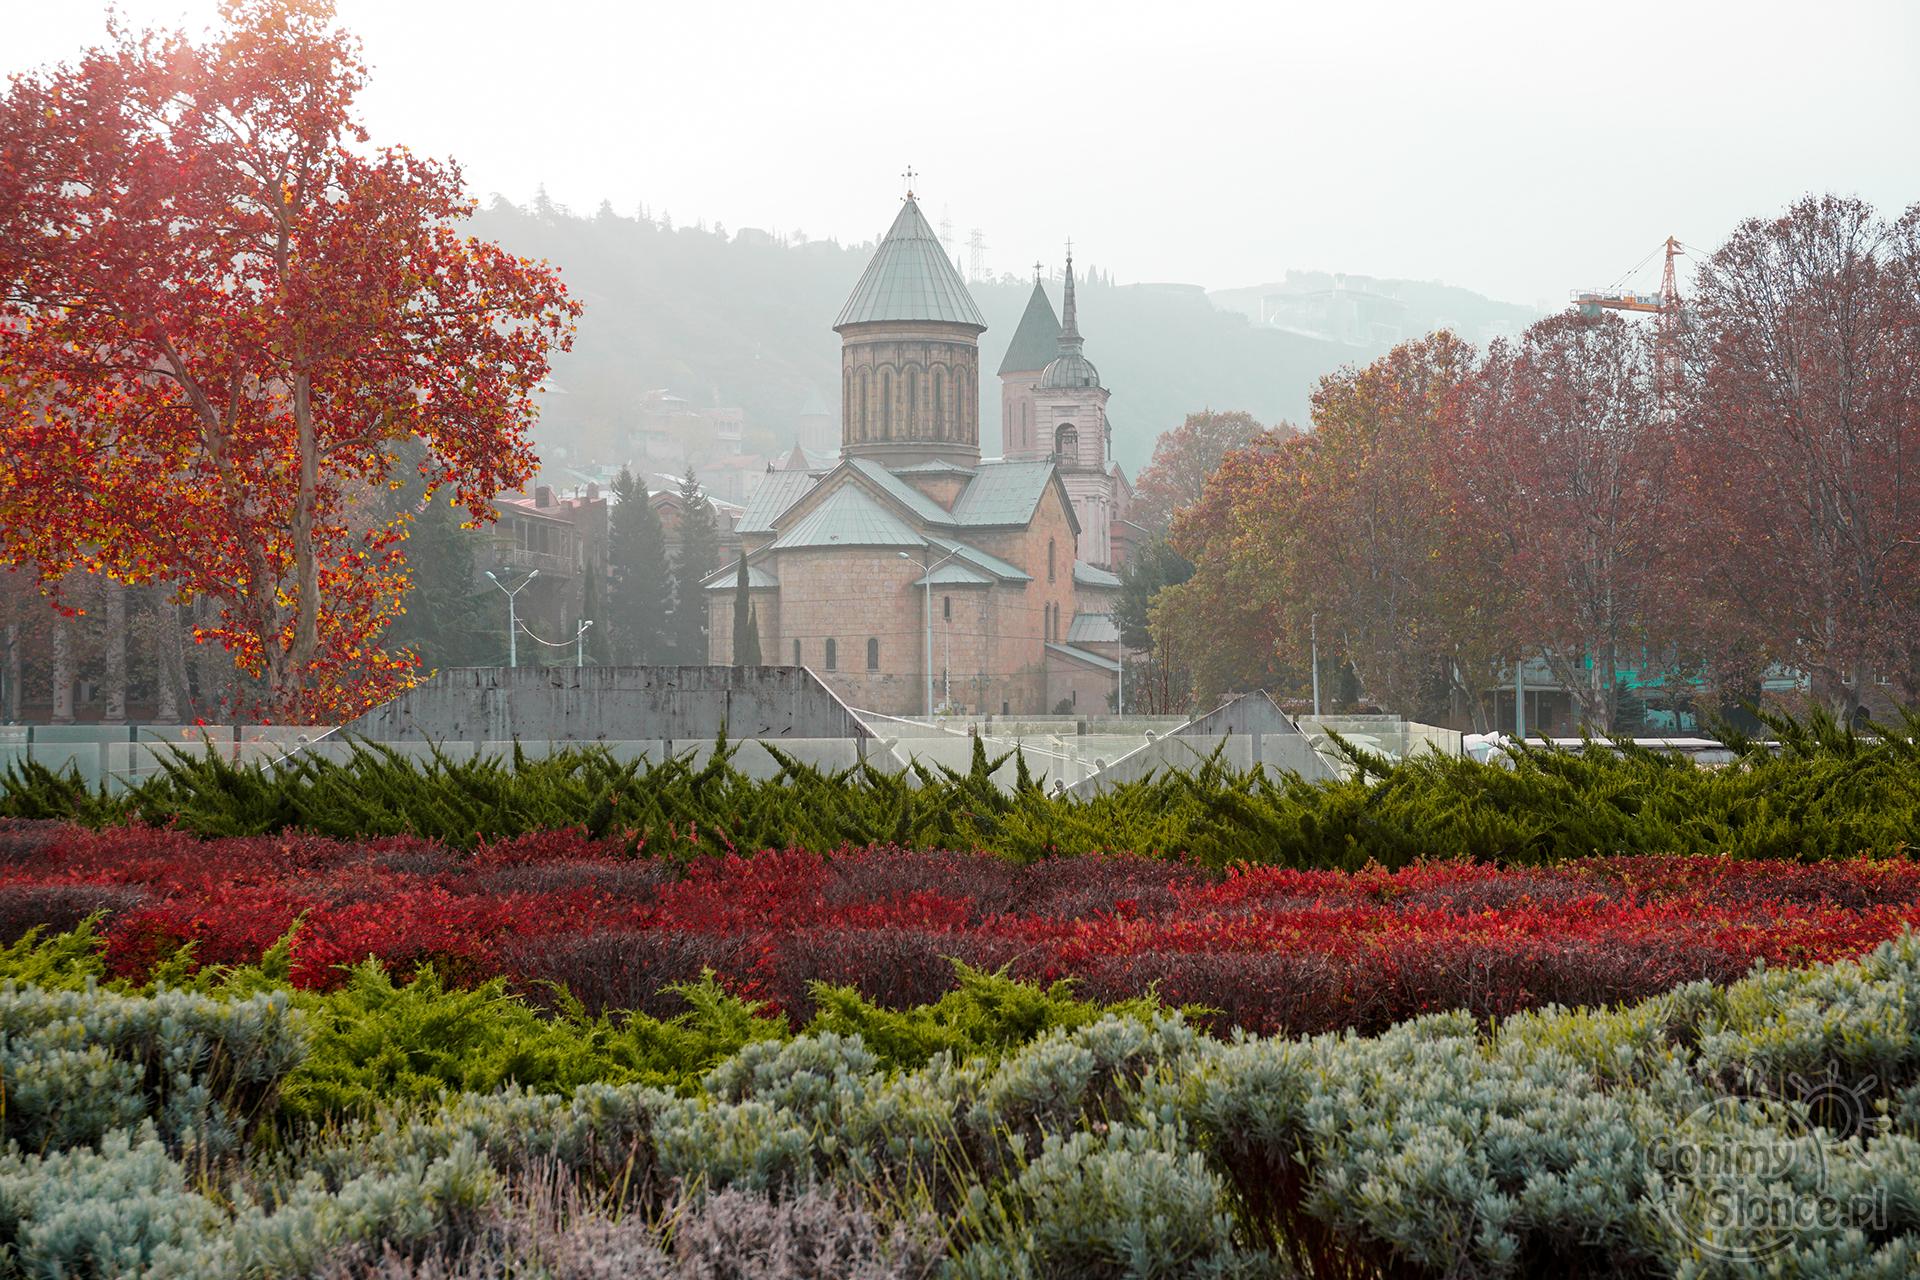 Tbilisi, Katedra Sioni, Gruzja 2017